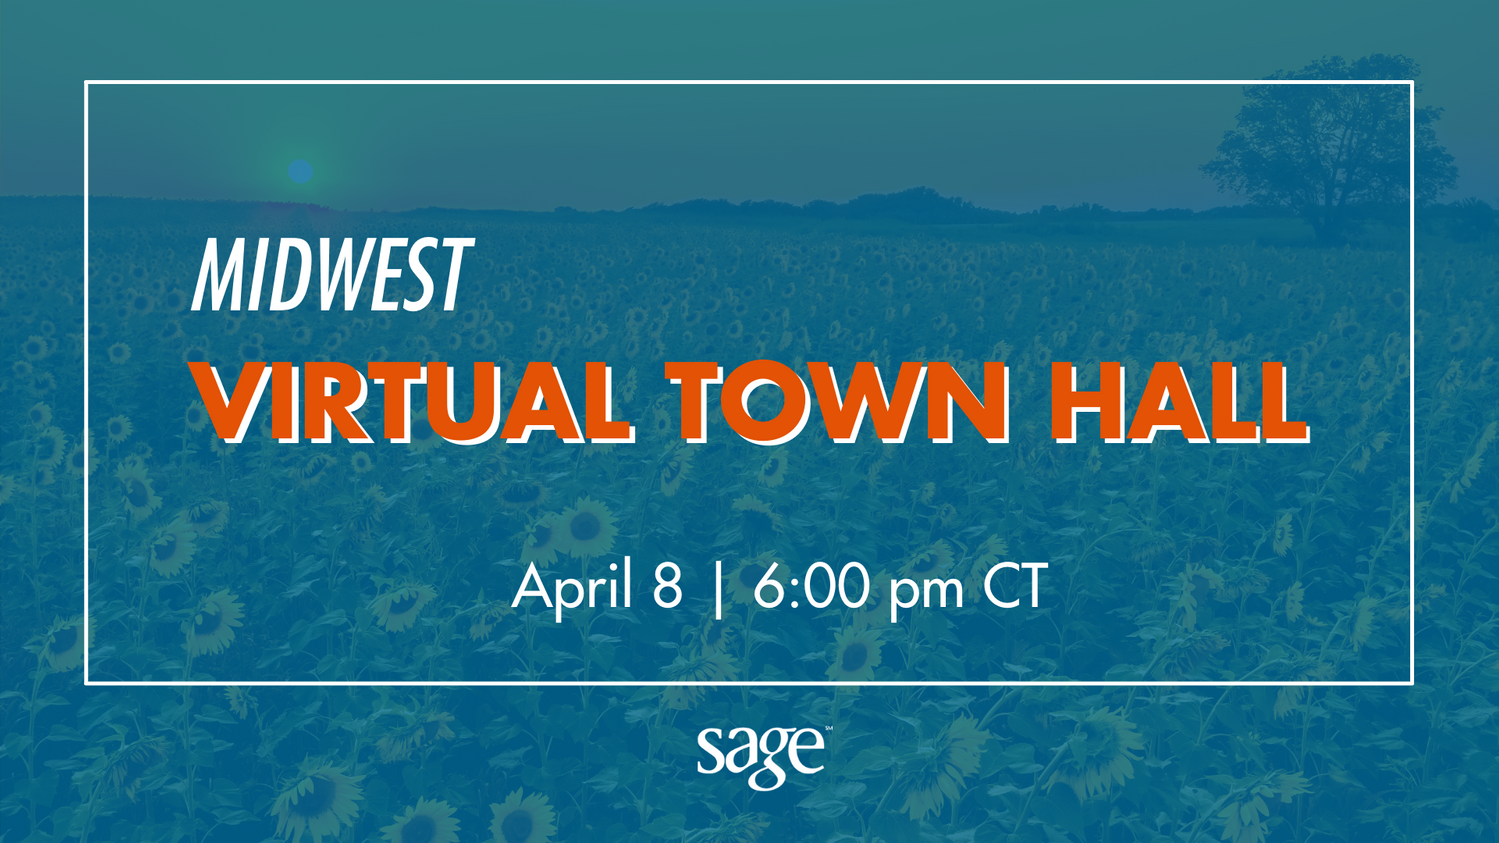 title-landscape-sage-midwest-virtual-town-hall